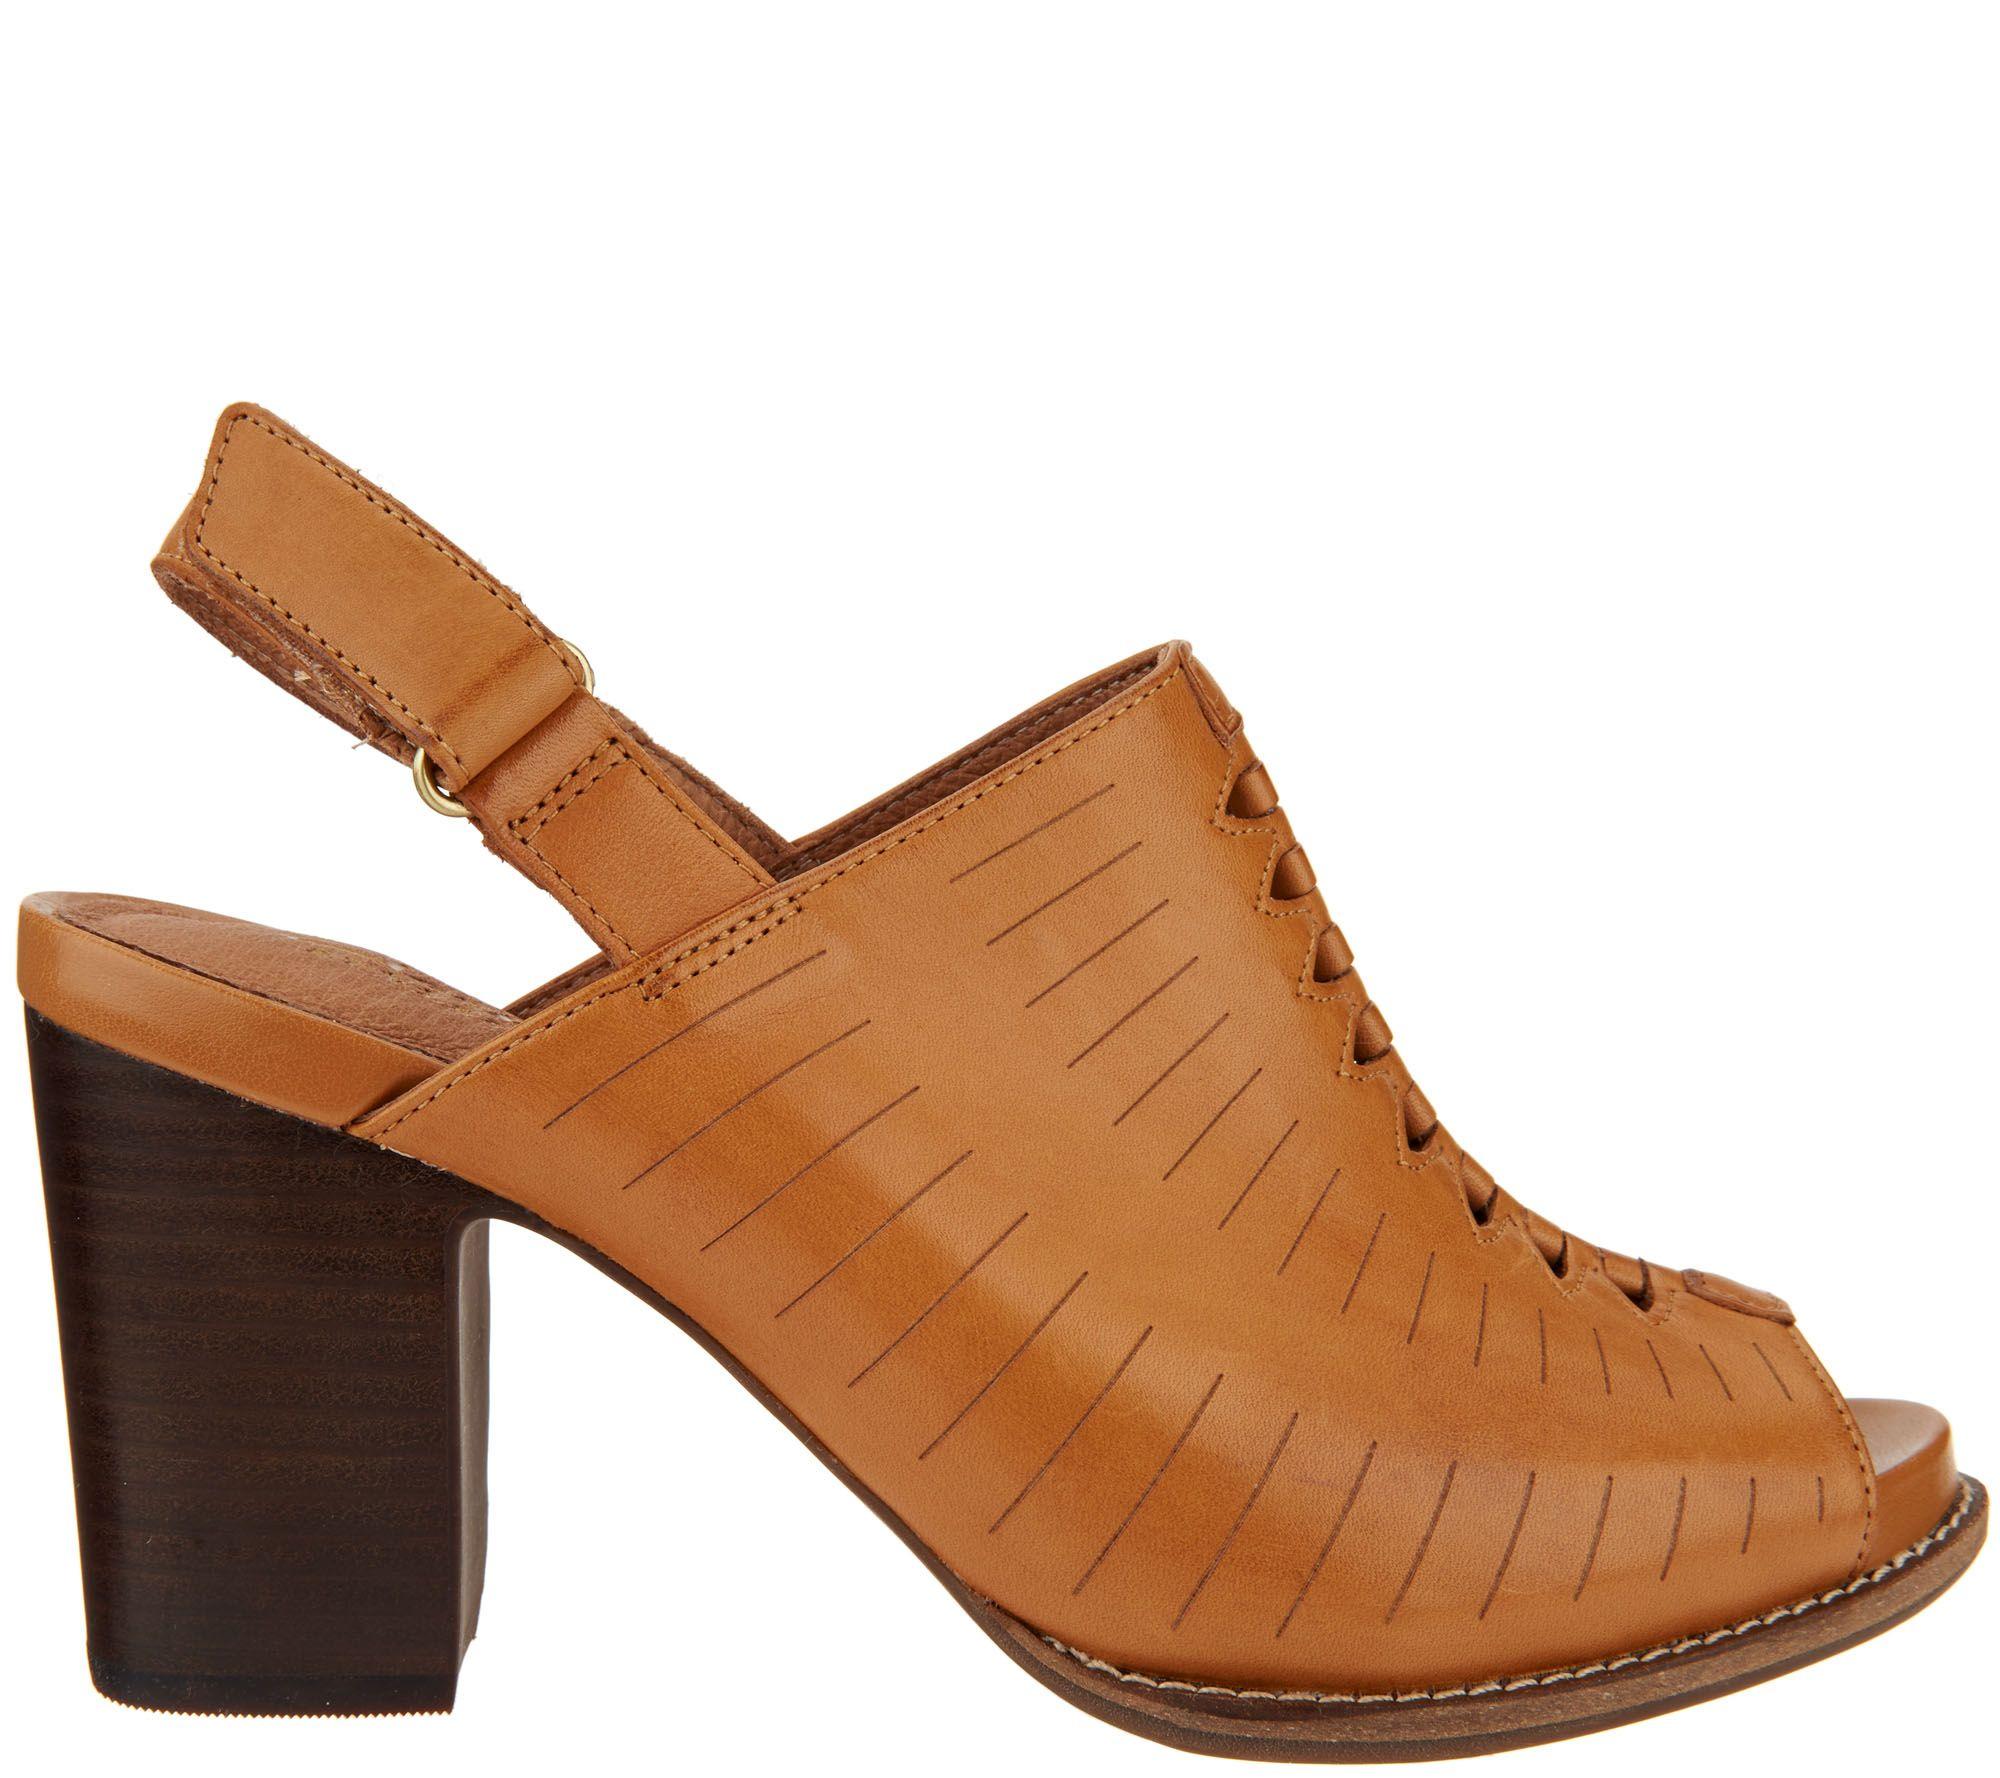 b55685d029e Clarks Artisan Leather Block Heel Sandals - Briatta Key - Page 1 — QVC.com